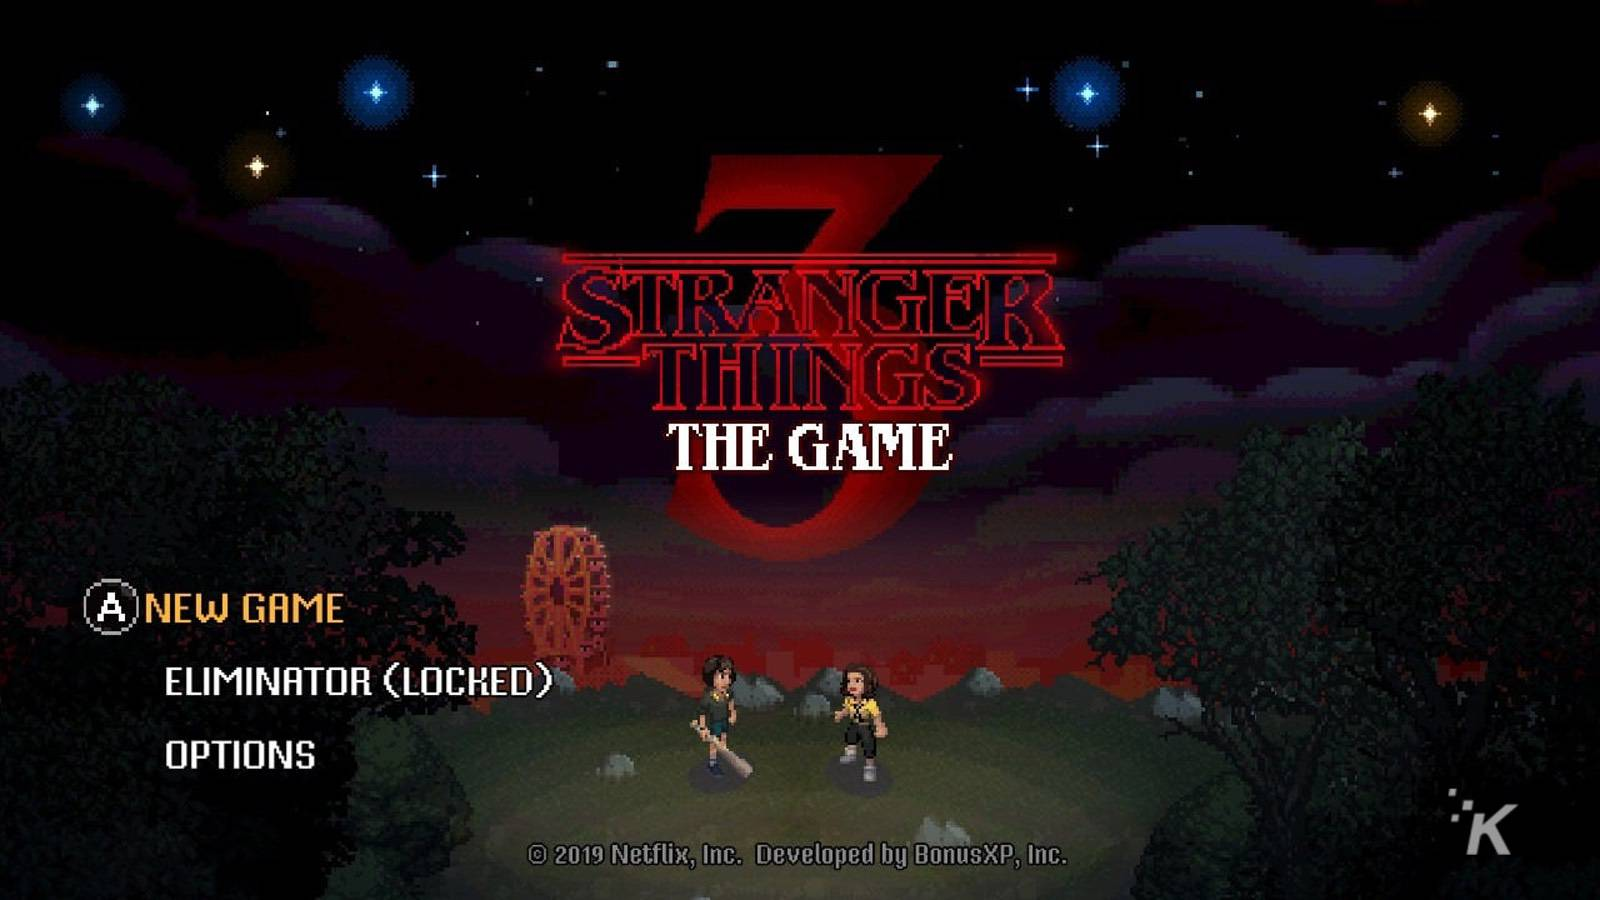 stranger things 3 title screen game